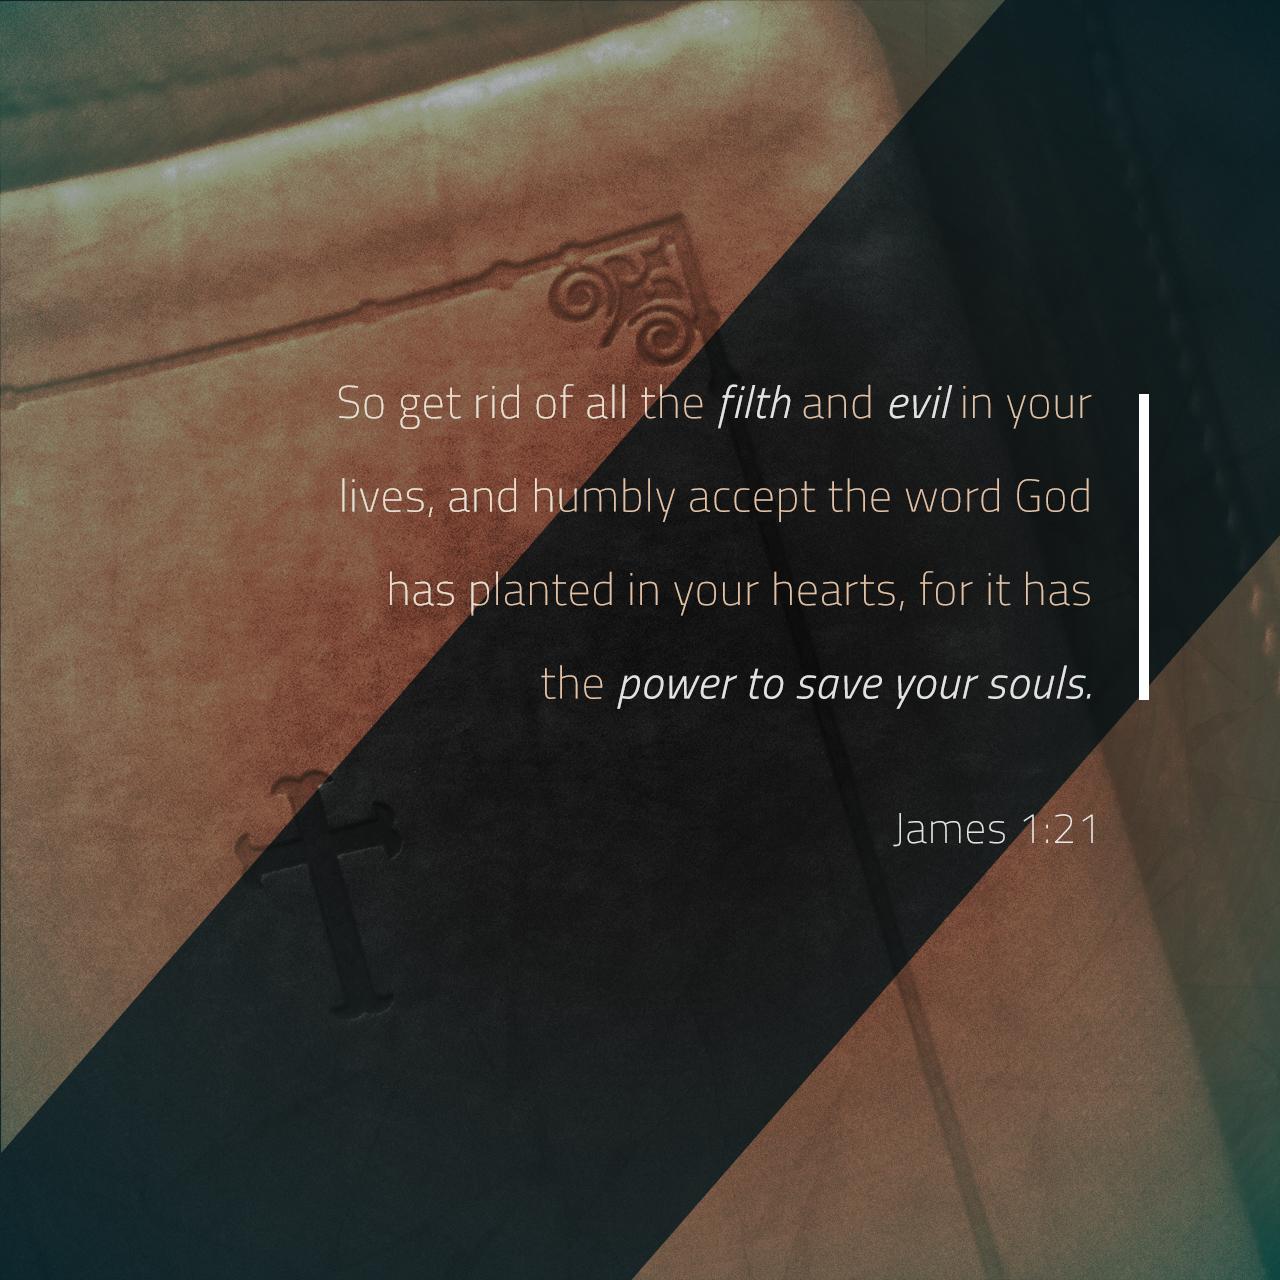 James 1:21